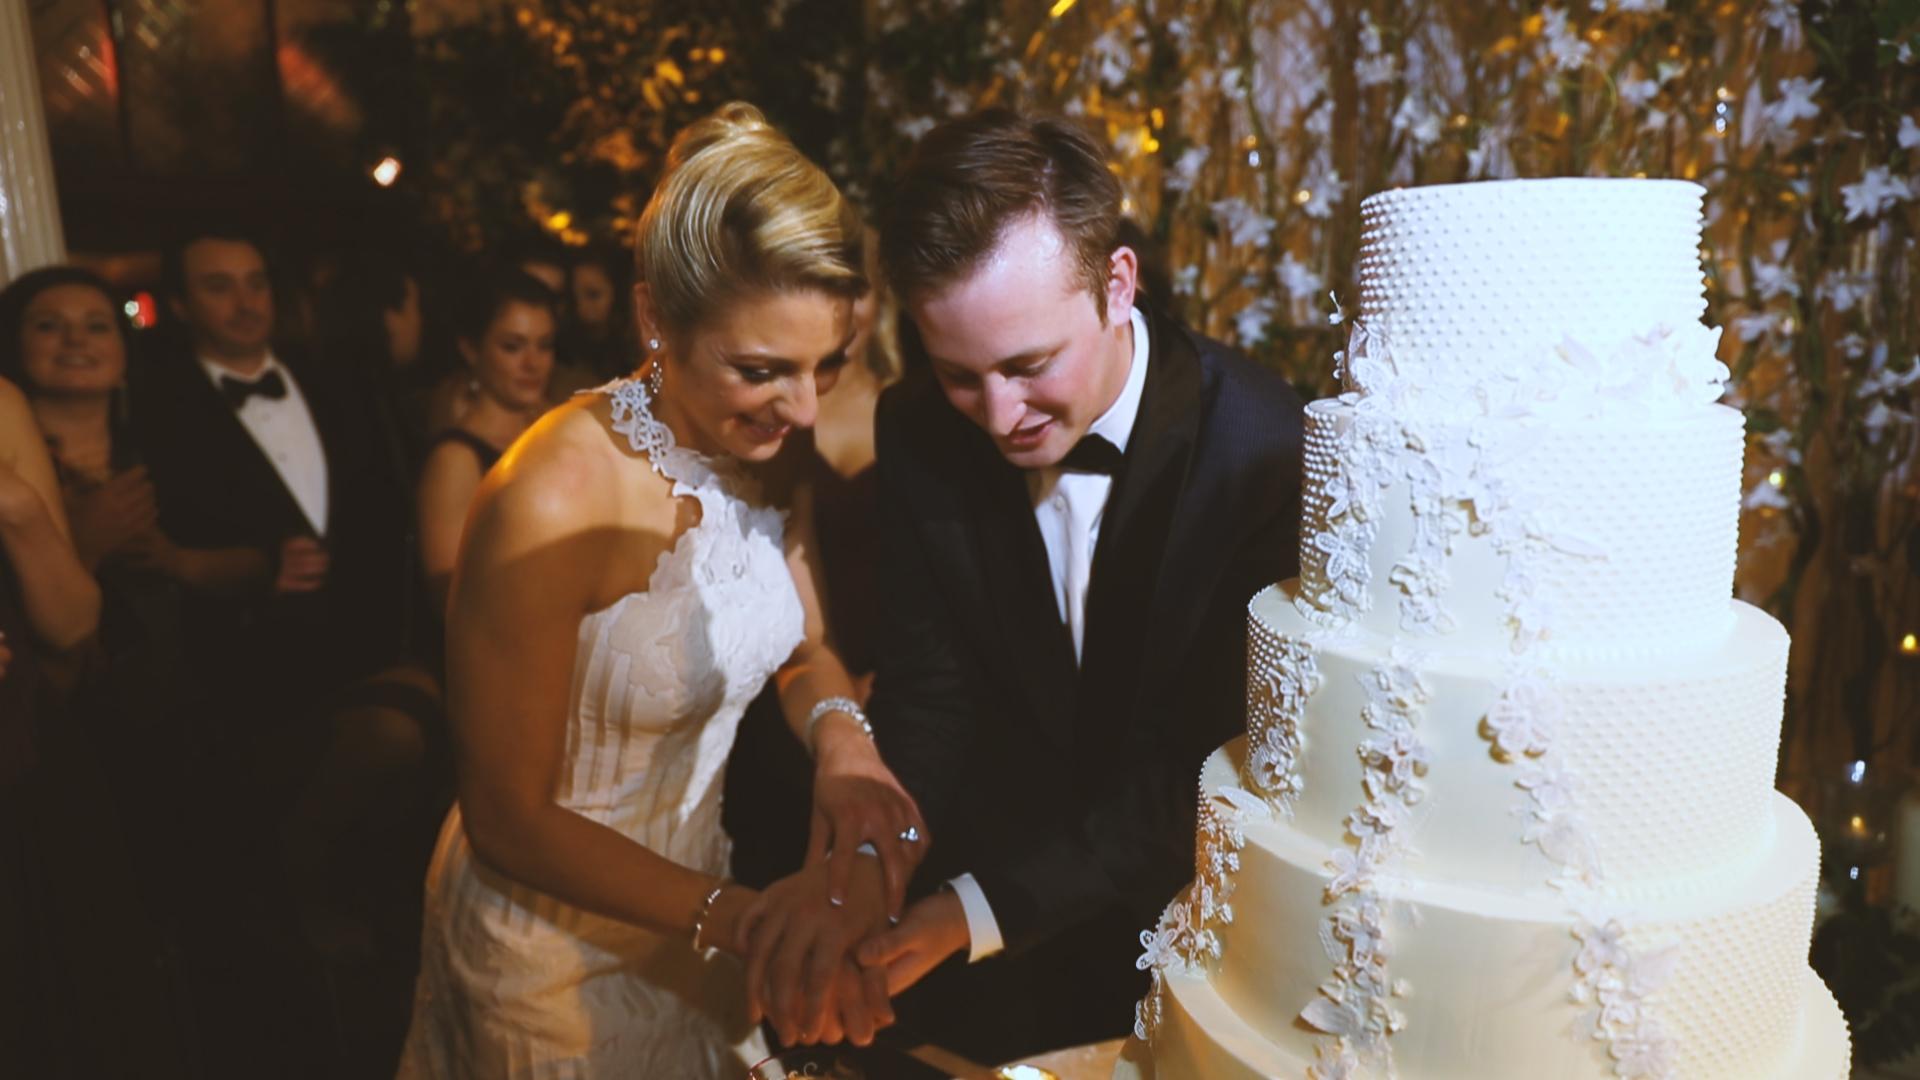 Wedding Cake - Bride Film